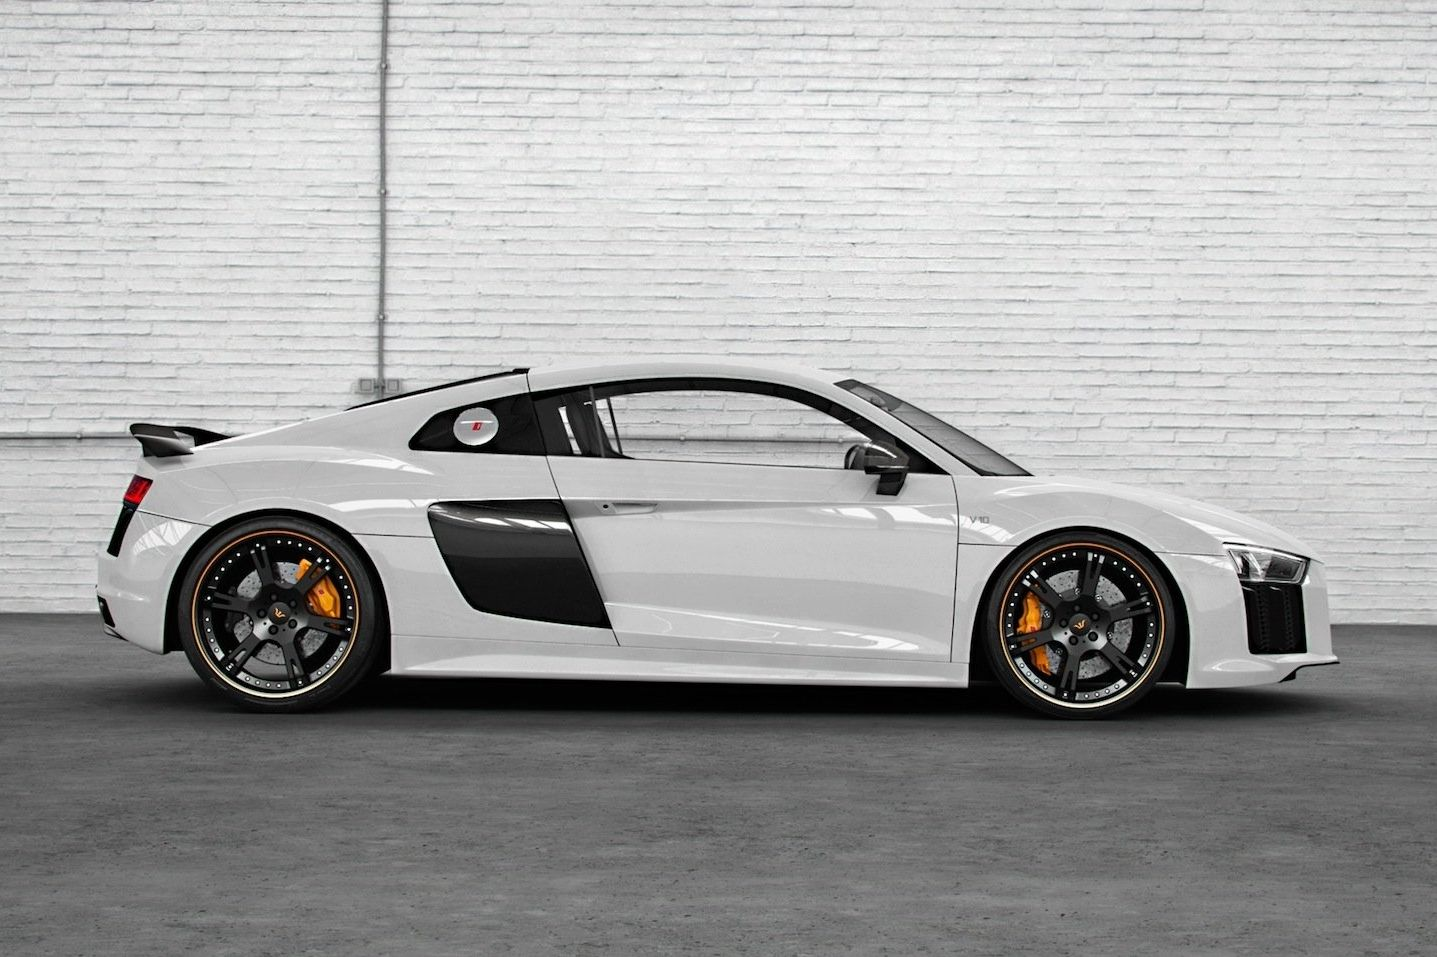 The Audi R8 V10 Plus Audi R8 V10 Plus Audi R8 V10 Audi